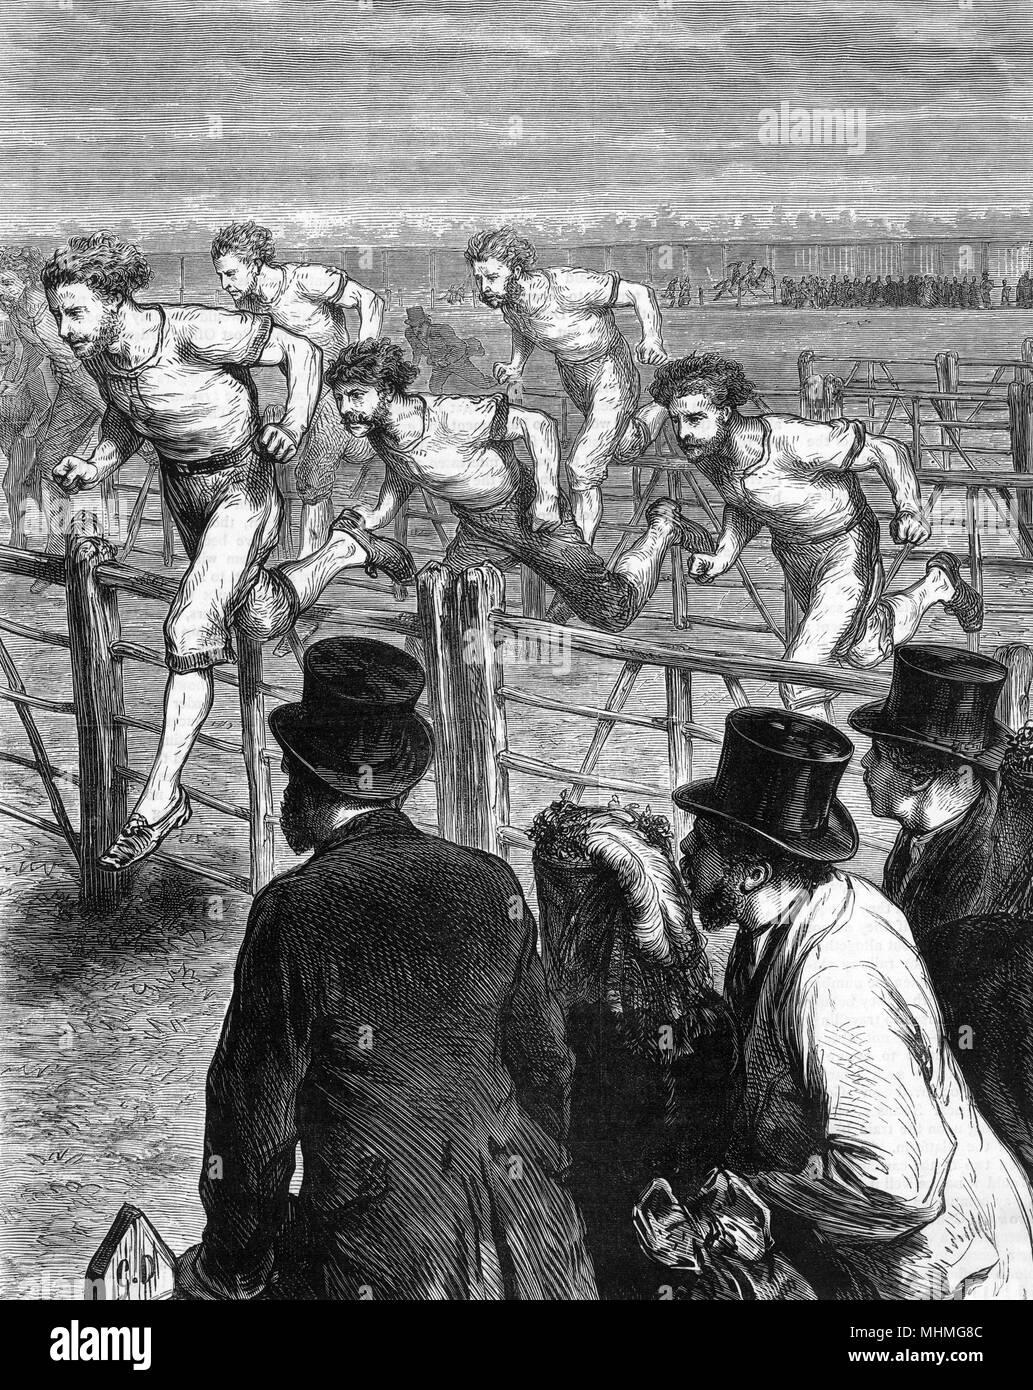 A hurdle race in Brompton, London.       Date: 1871 - Stock Image